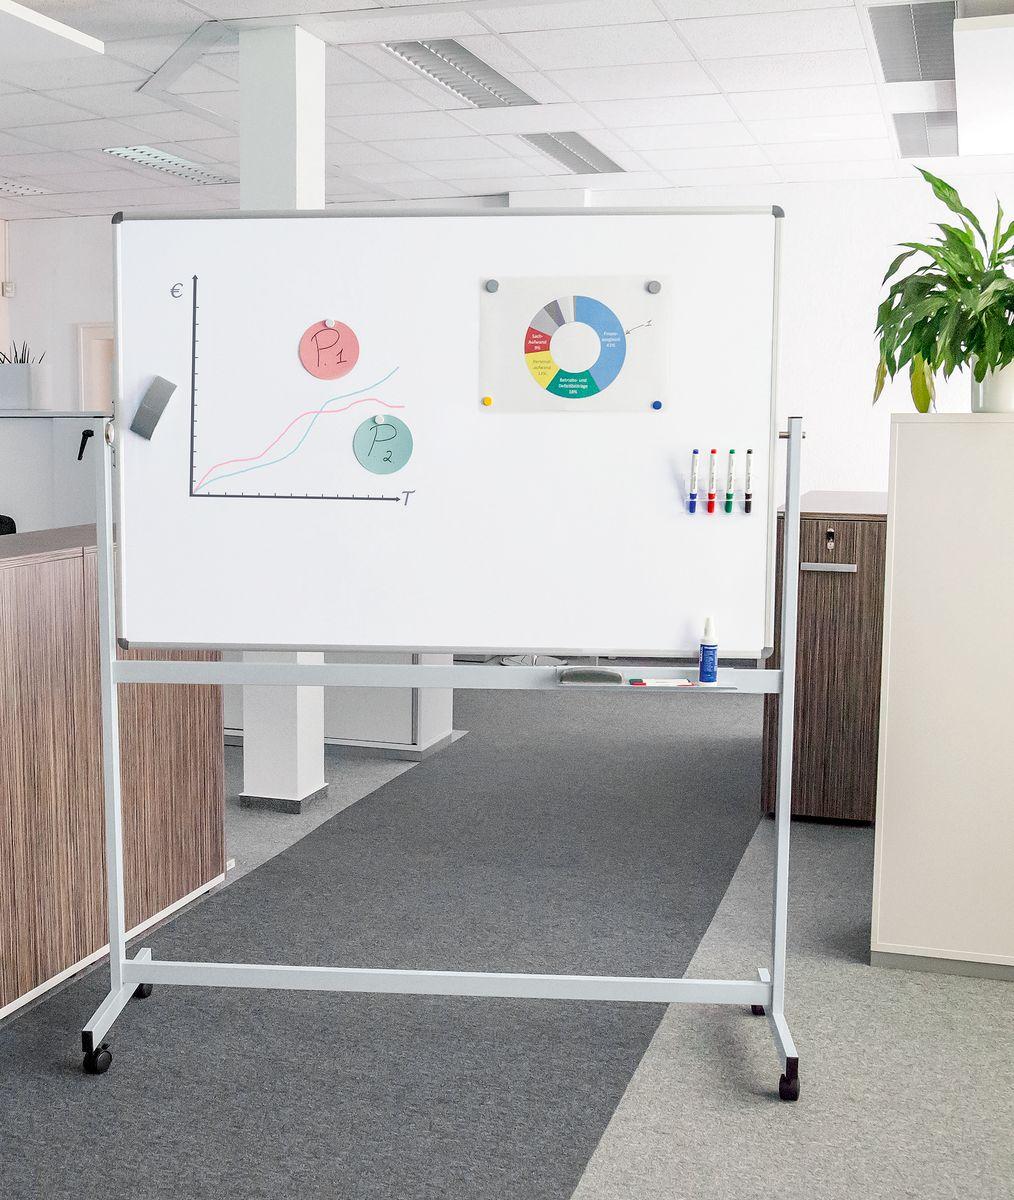 mobiles whiteboard maulstandard drehbar g nstig kaufen sch fer shop. Black Bedroom Furniture Sets. Home Design Ideas